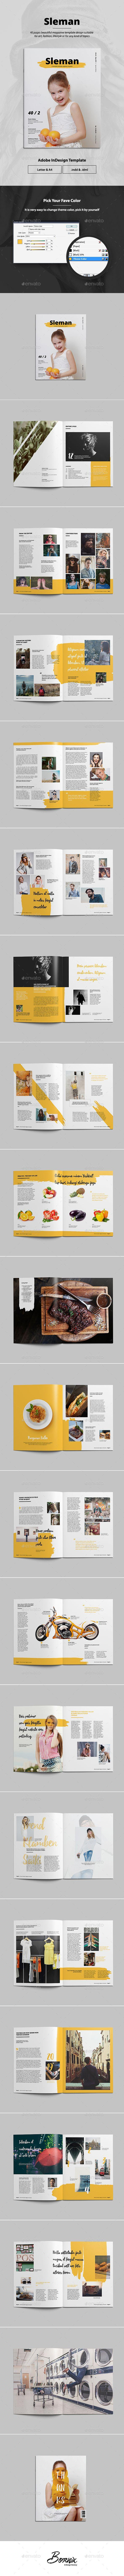 Sleman Modern Magazine Template   Revistas